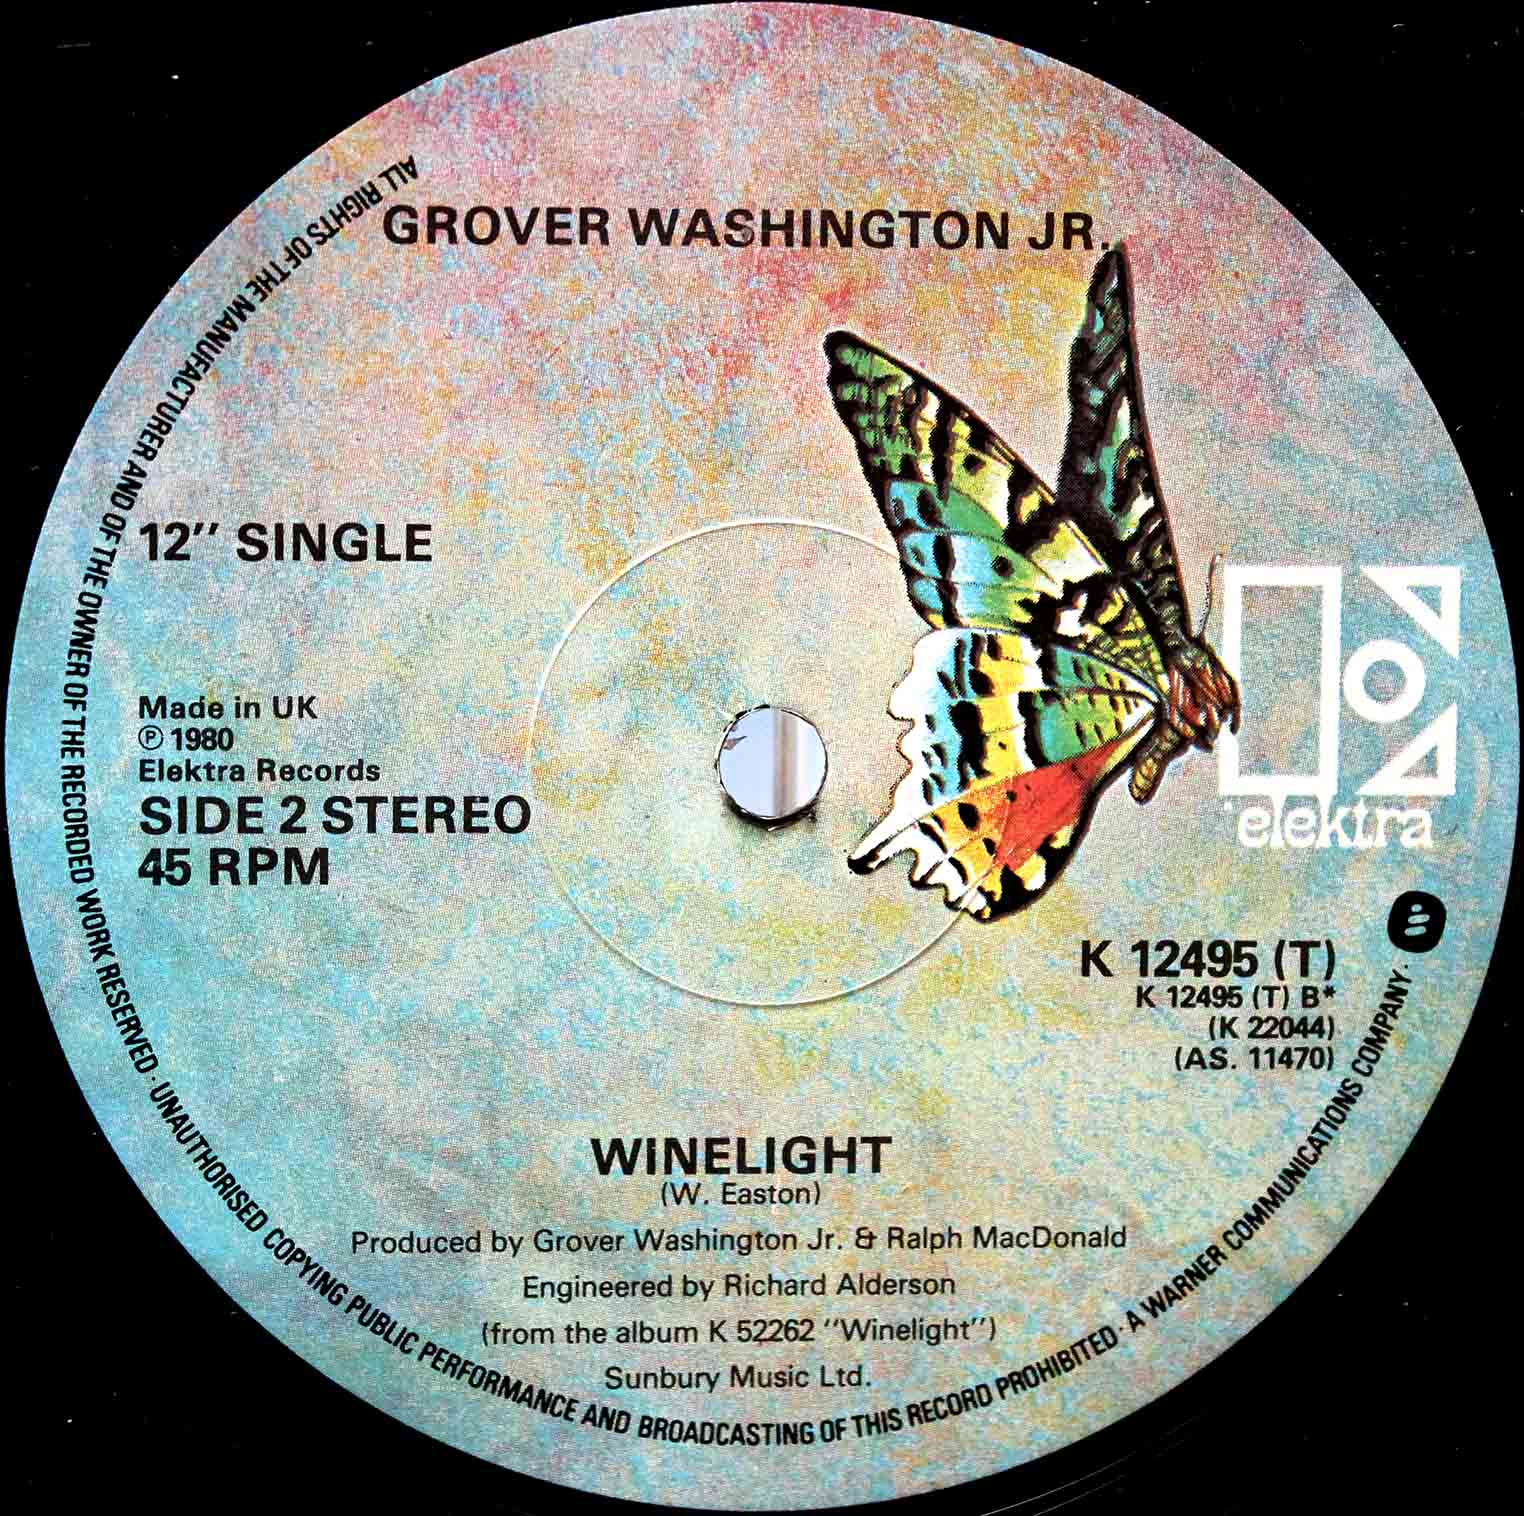 Grover Washington, Jr - Winelight 02